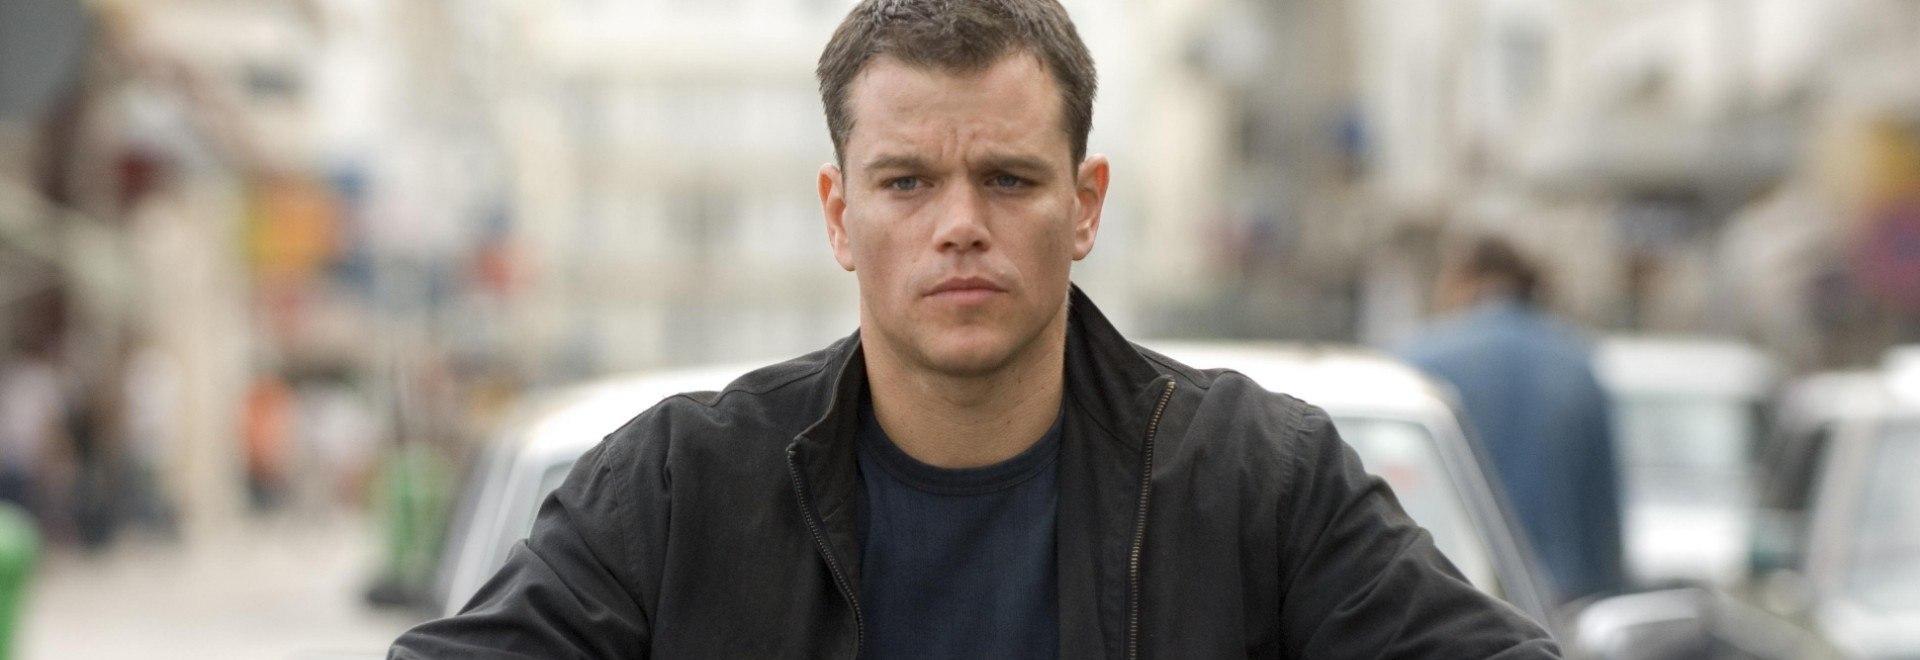 Xl - Jason Bourne - Speciale